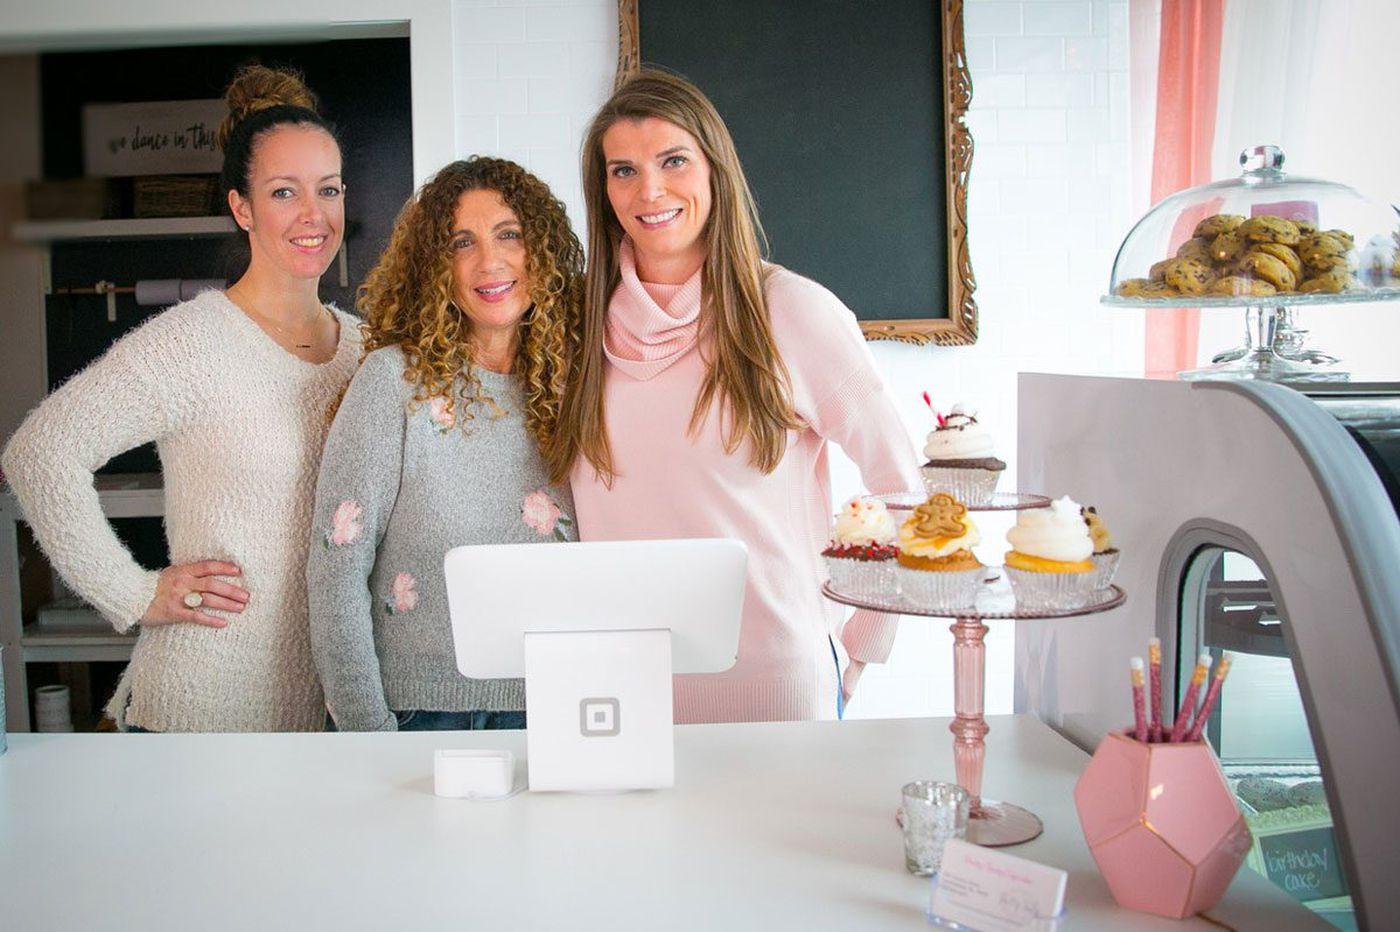 Nut-free cupcake bakery opens in Conshohocken